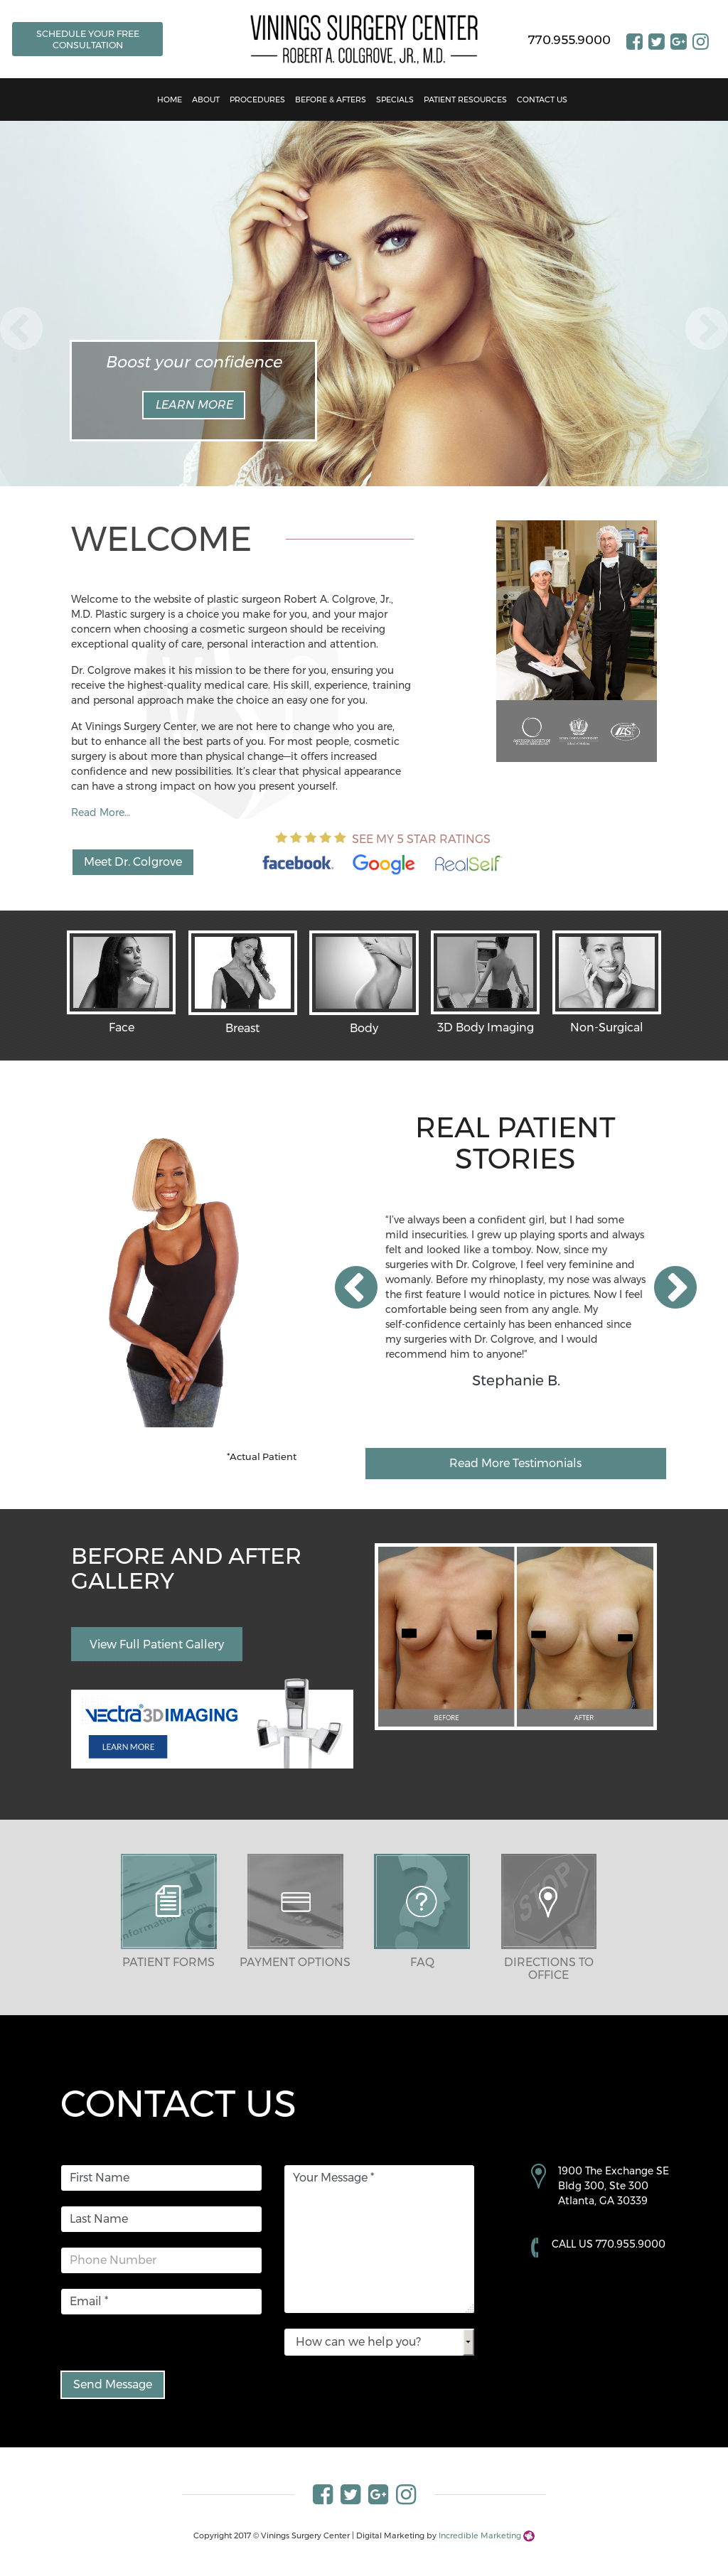 Phrase, Vinings breast augmentation surgeon something is